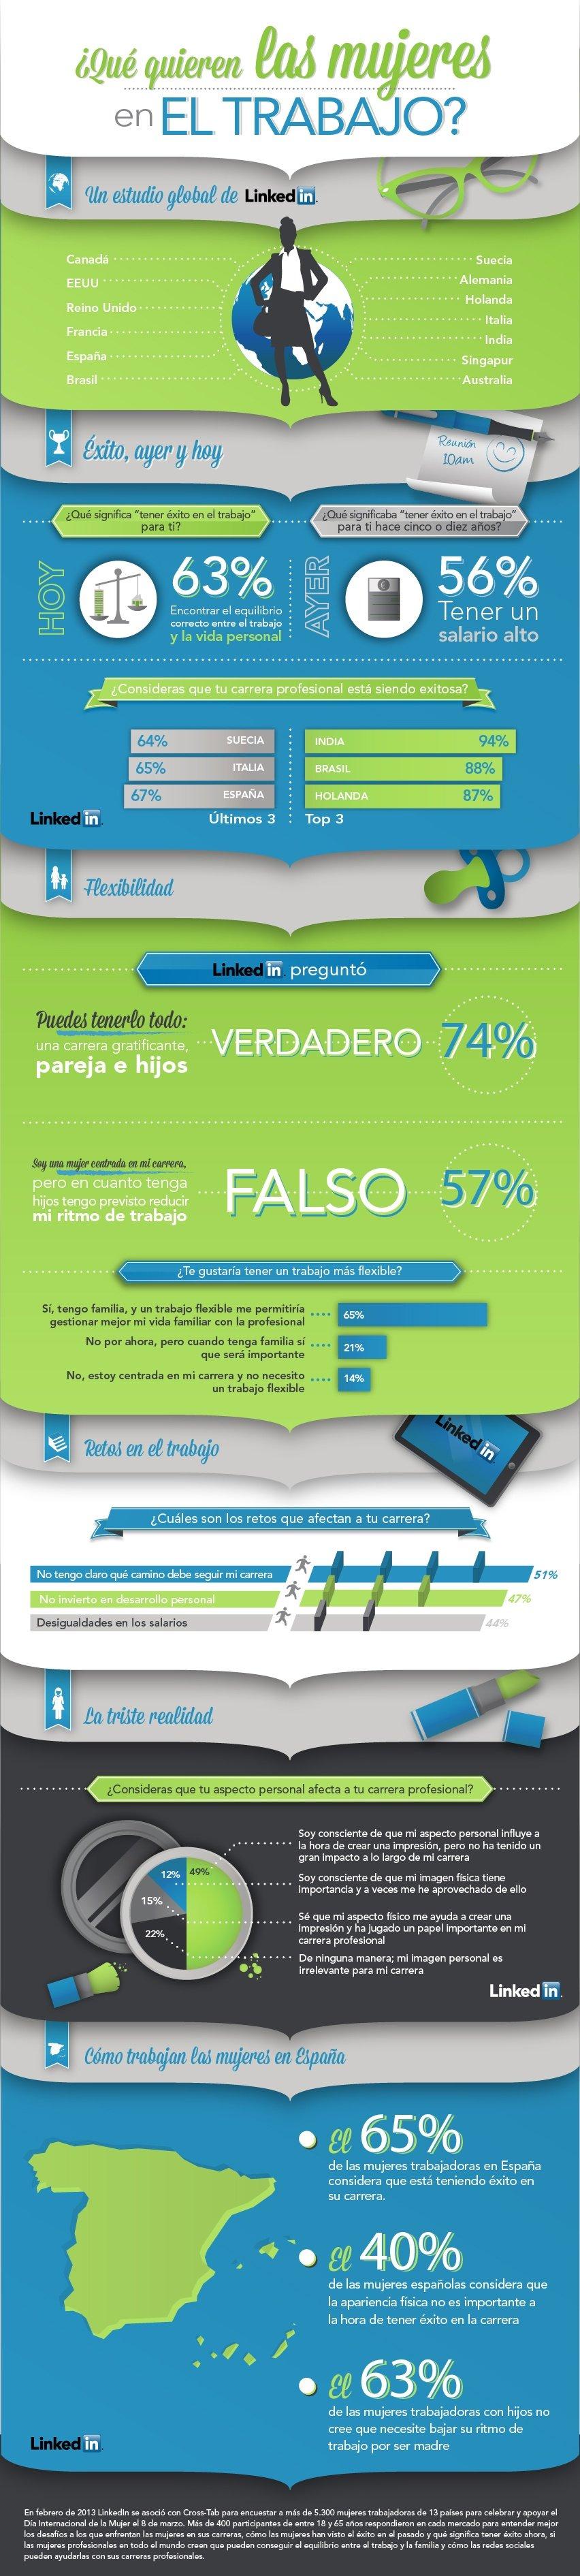 LI_Women@Work_resultados España